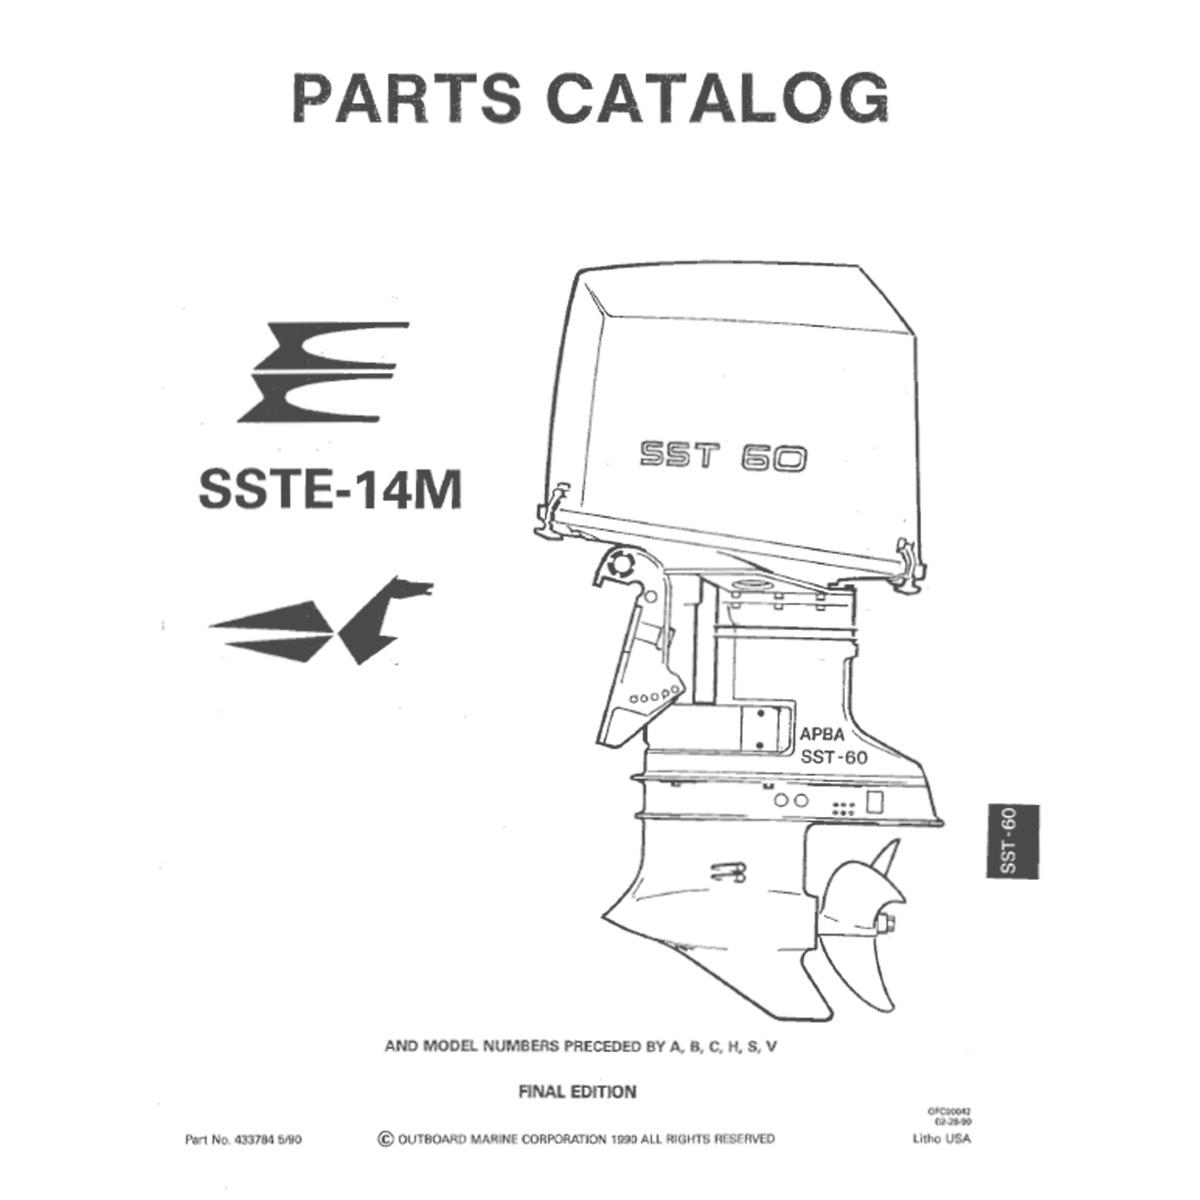 Seebold-Sports-Parts-Catalog-SSTE-14M